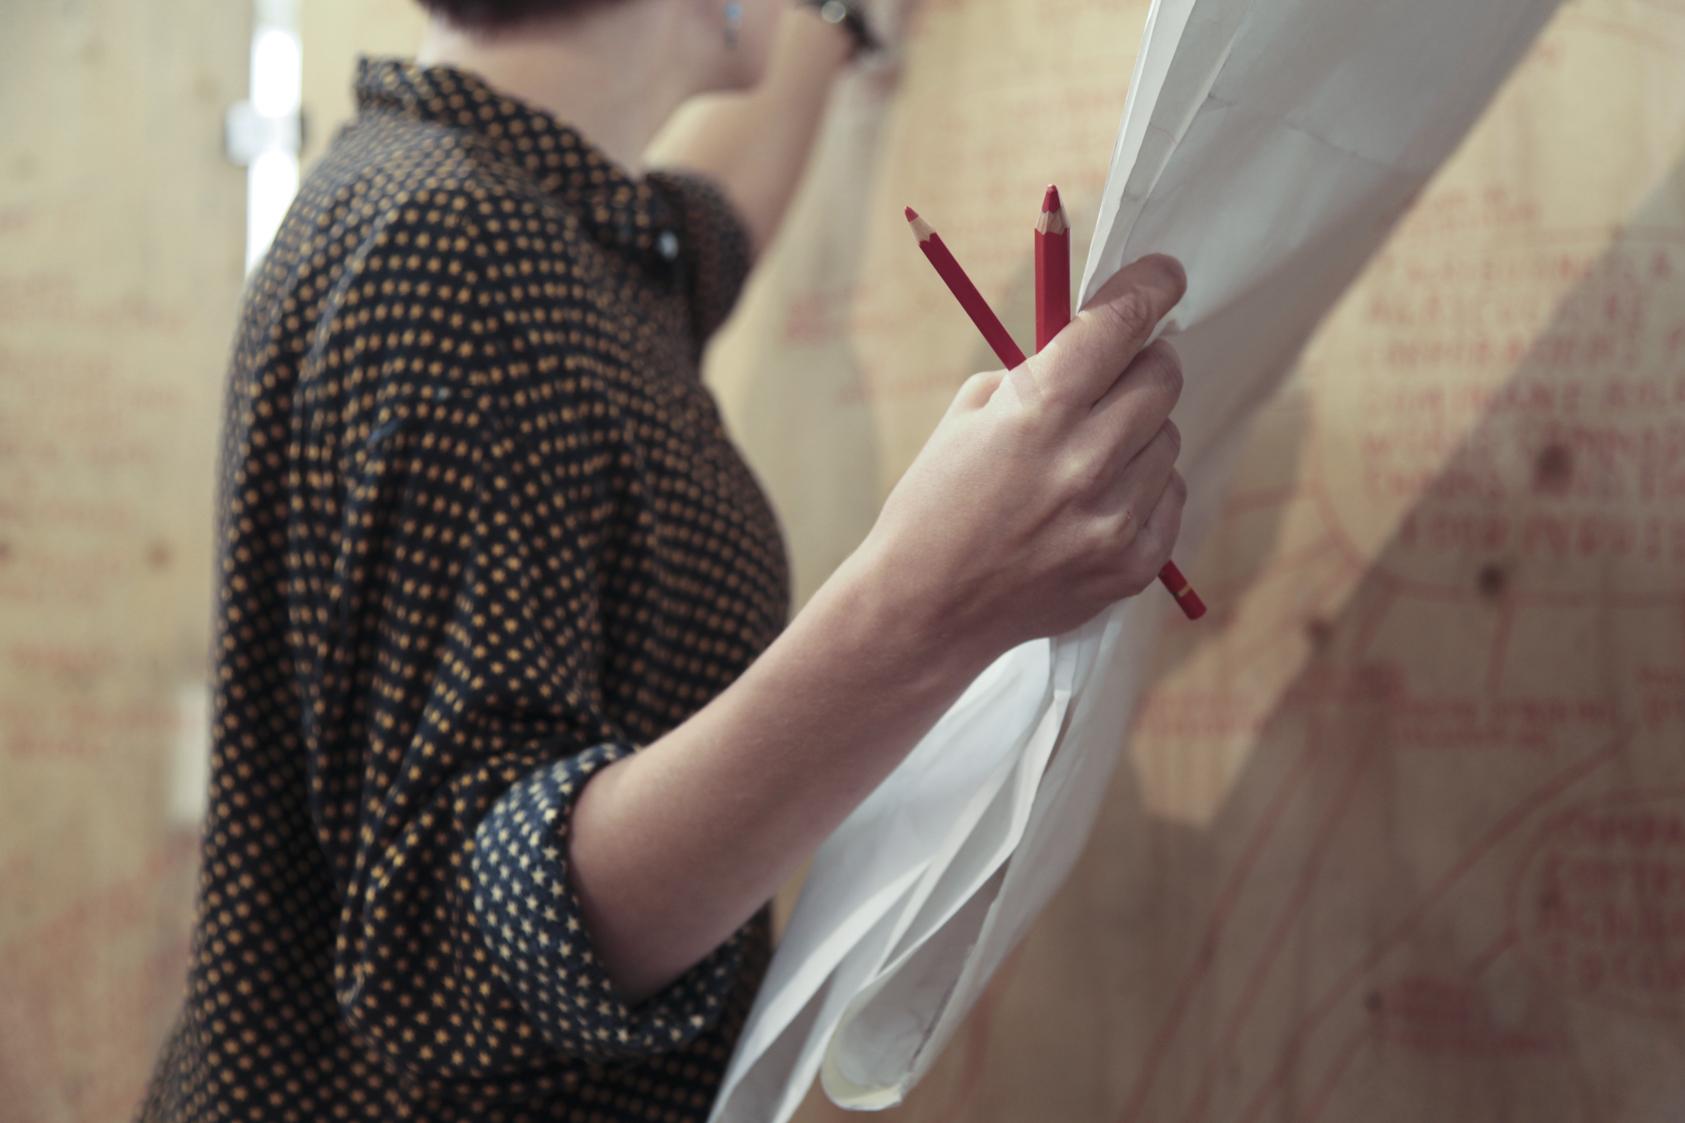 """Follow the money"" - et kunstprosjekt om Norges oljerikdom av Minna Henriksson og ungdom fra Romsås, i 2013. Foto: Una Line Ree Hunderi."